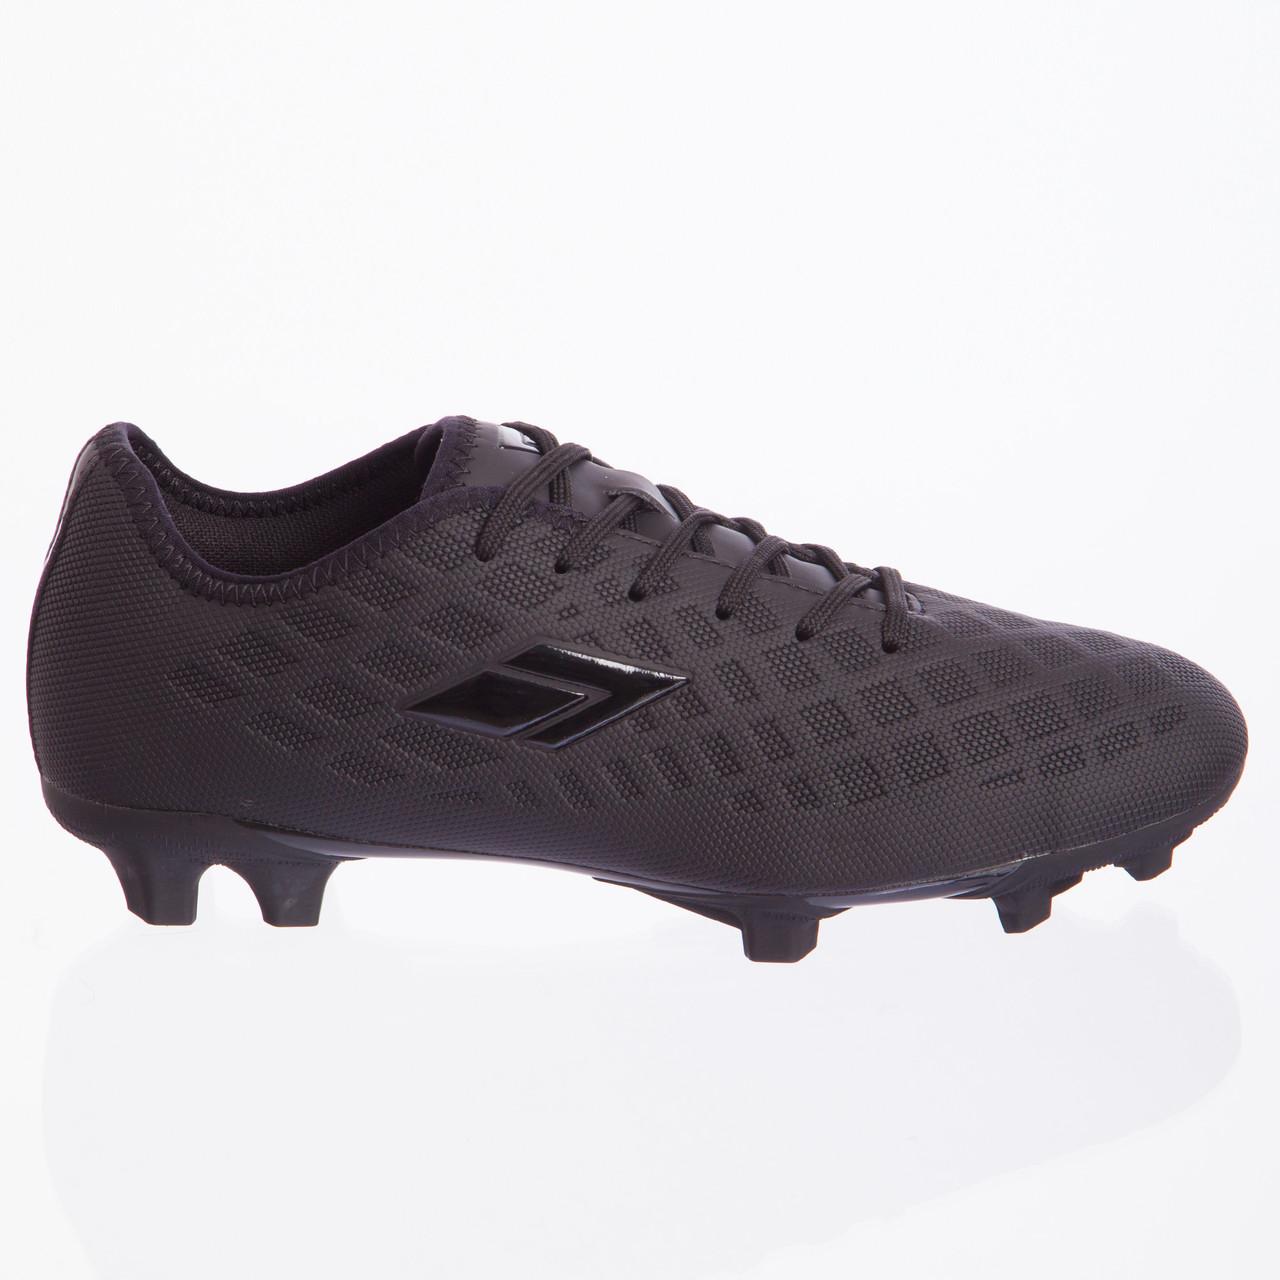 Бутсы футбольная обувь 180306-3 ALL BLACK размер 40-45 (TPU, черный)